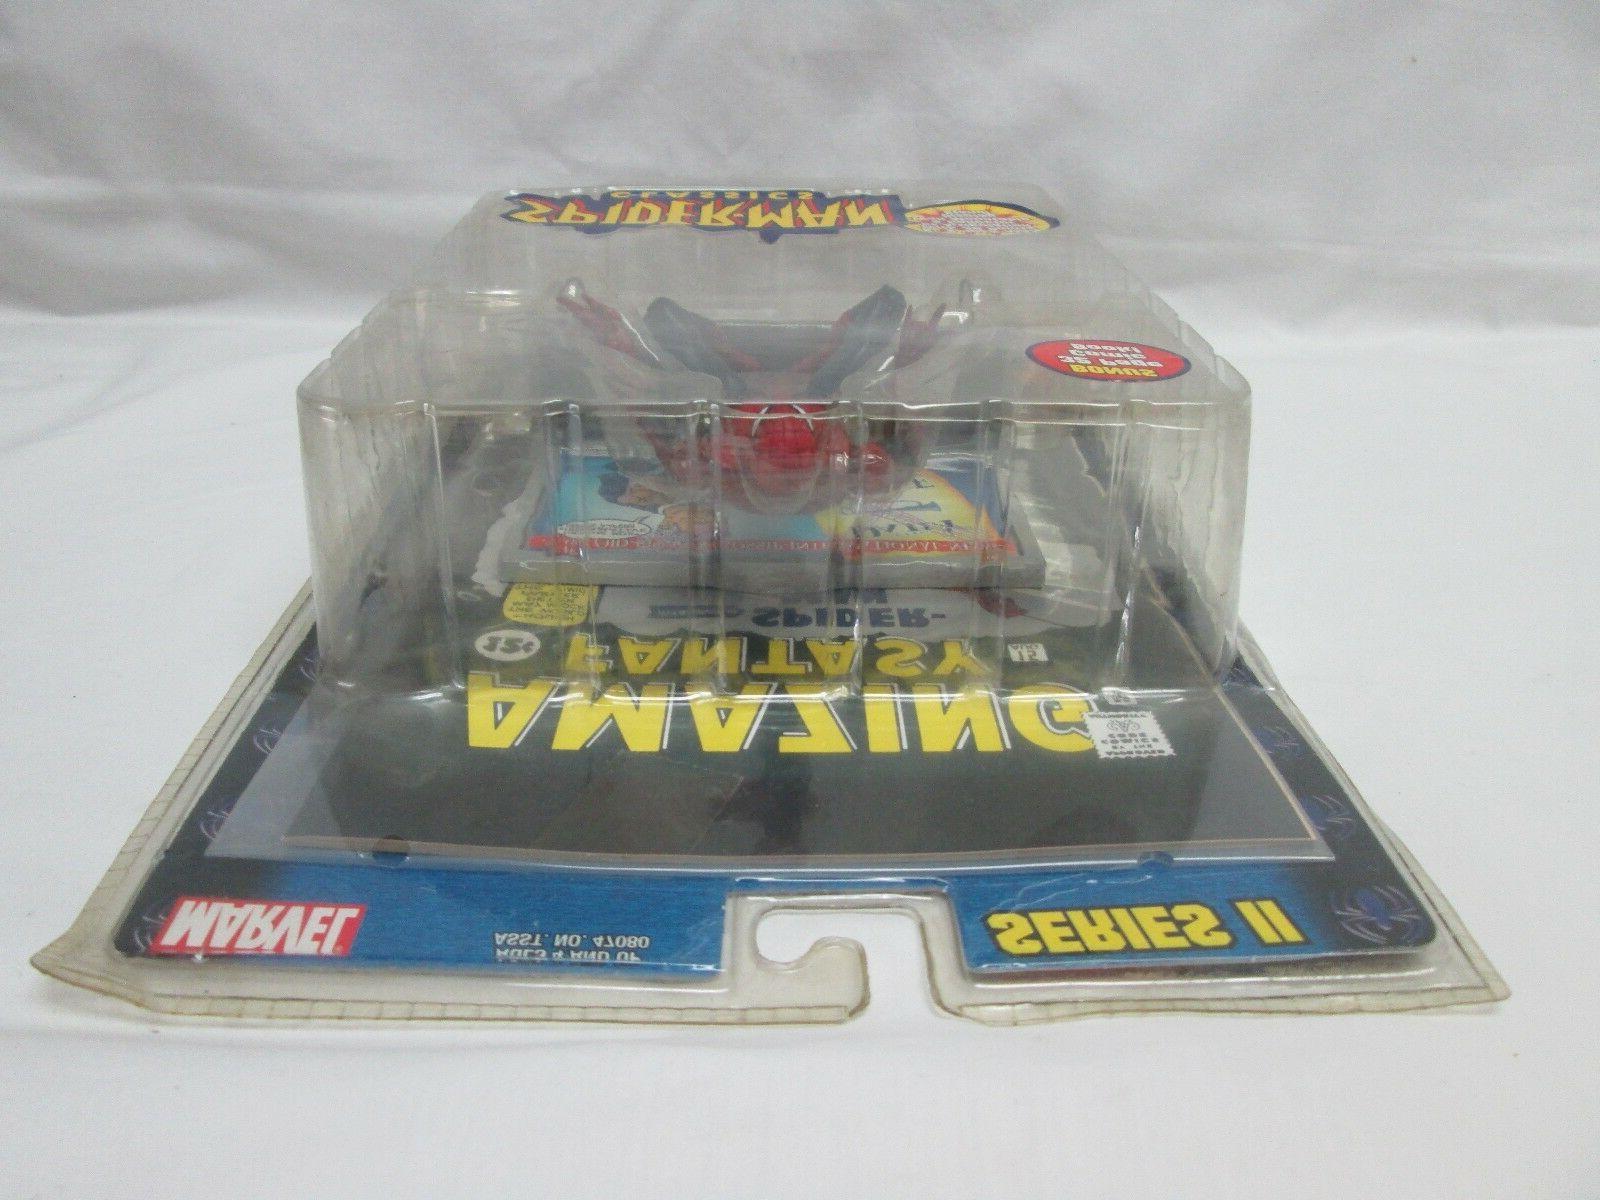 SPIDER MAN Classics 2001 Toy